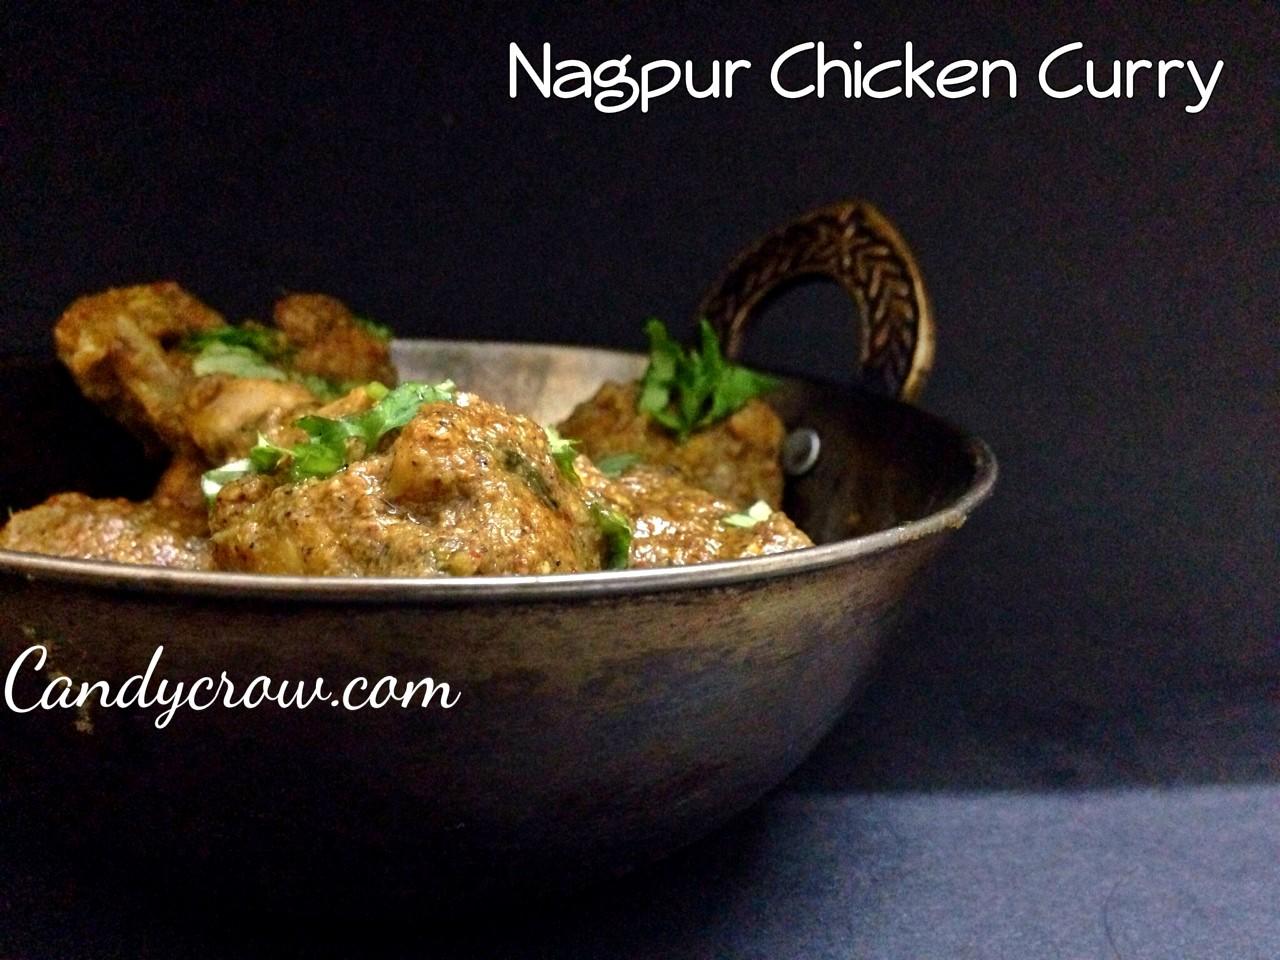 Nagpur Chicken Curry Recipe